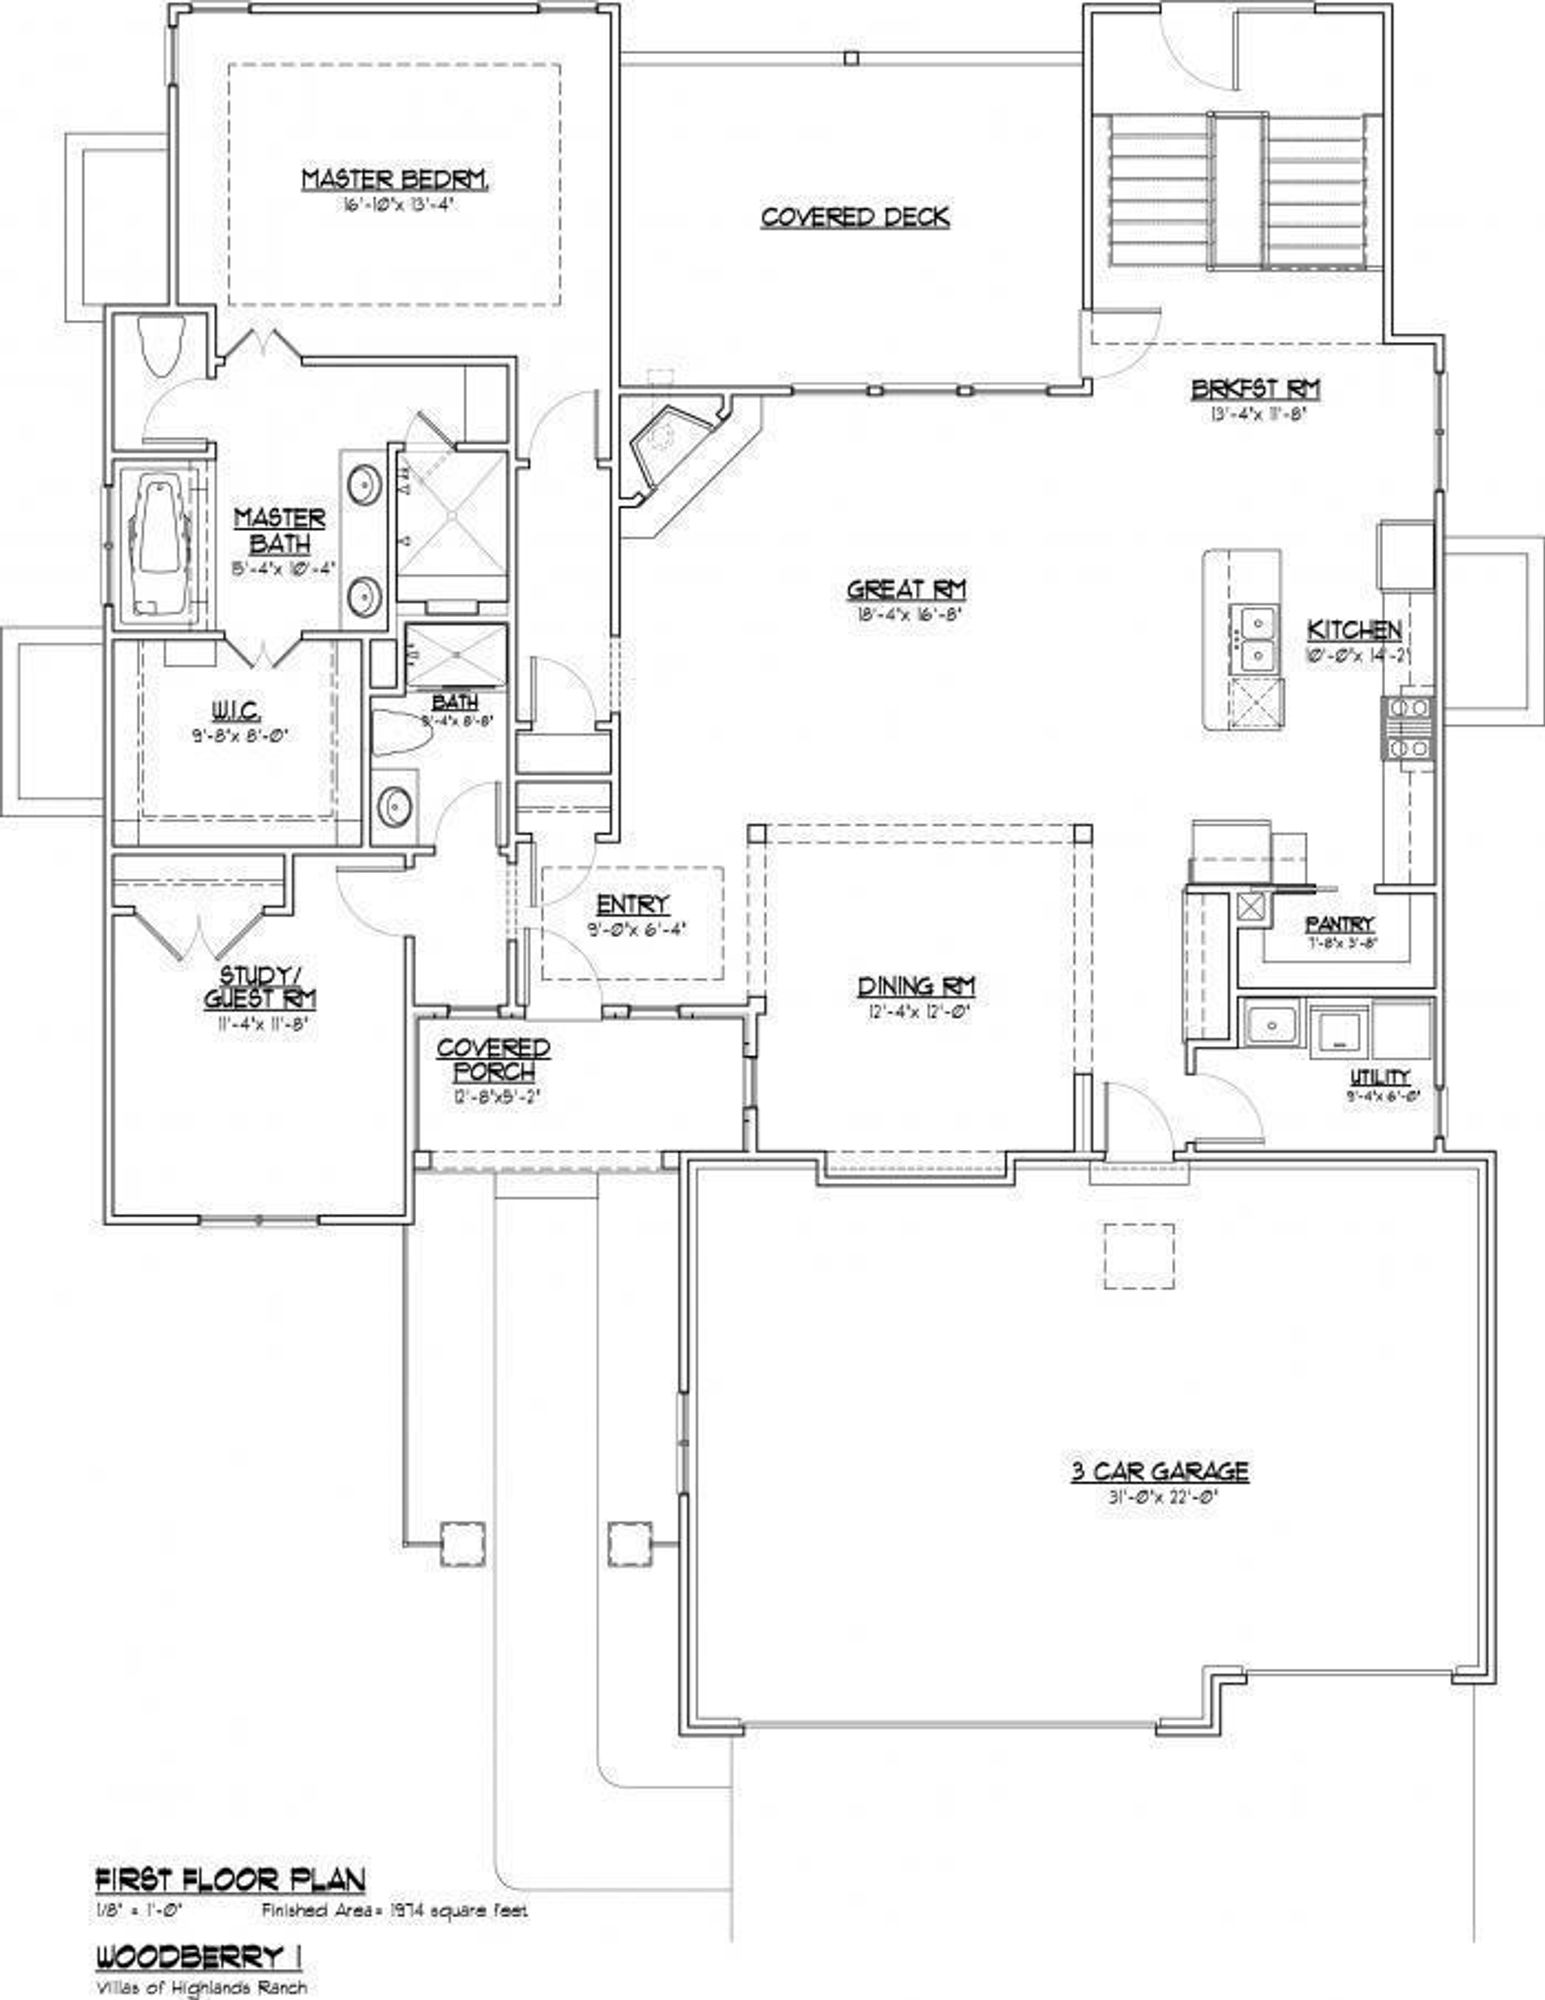 VHR The Kendalwood main level footprint